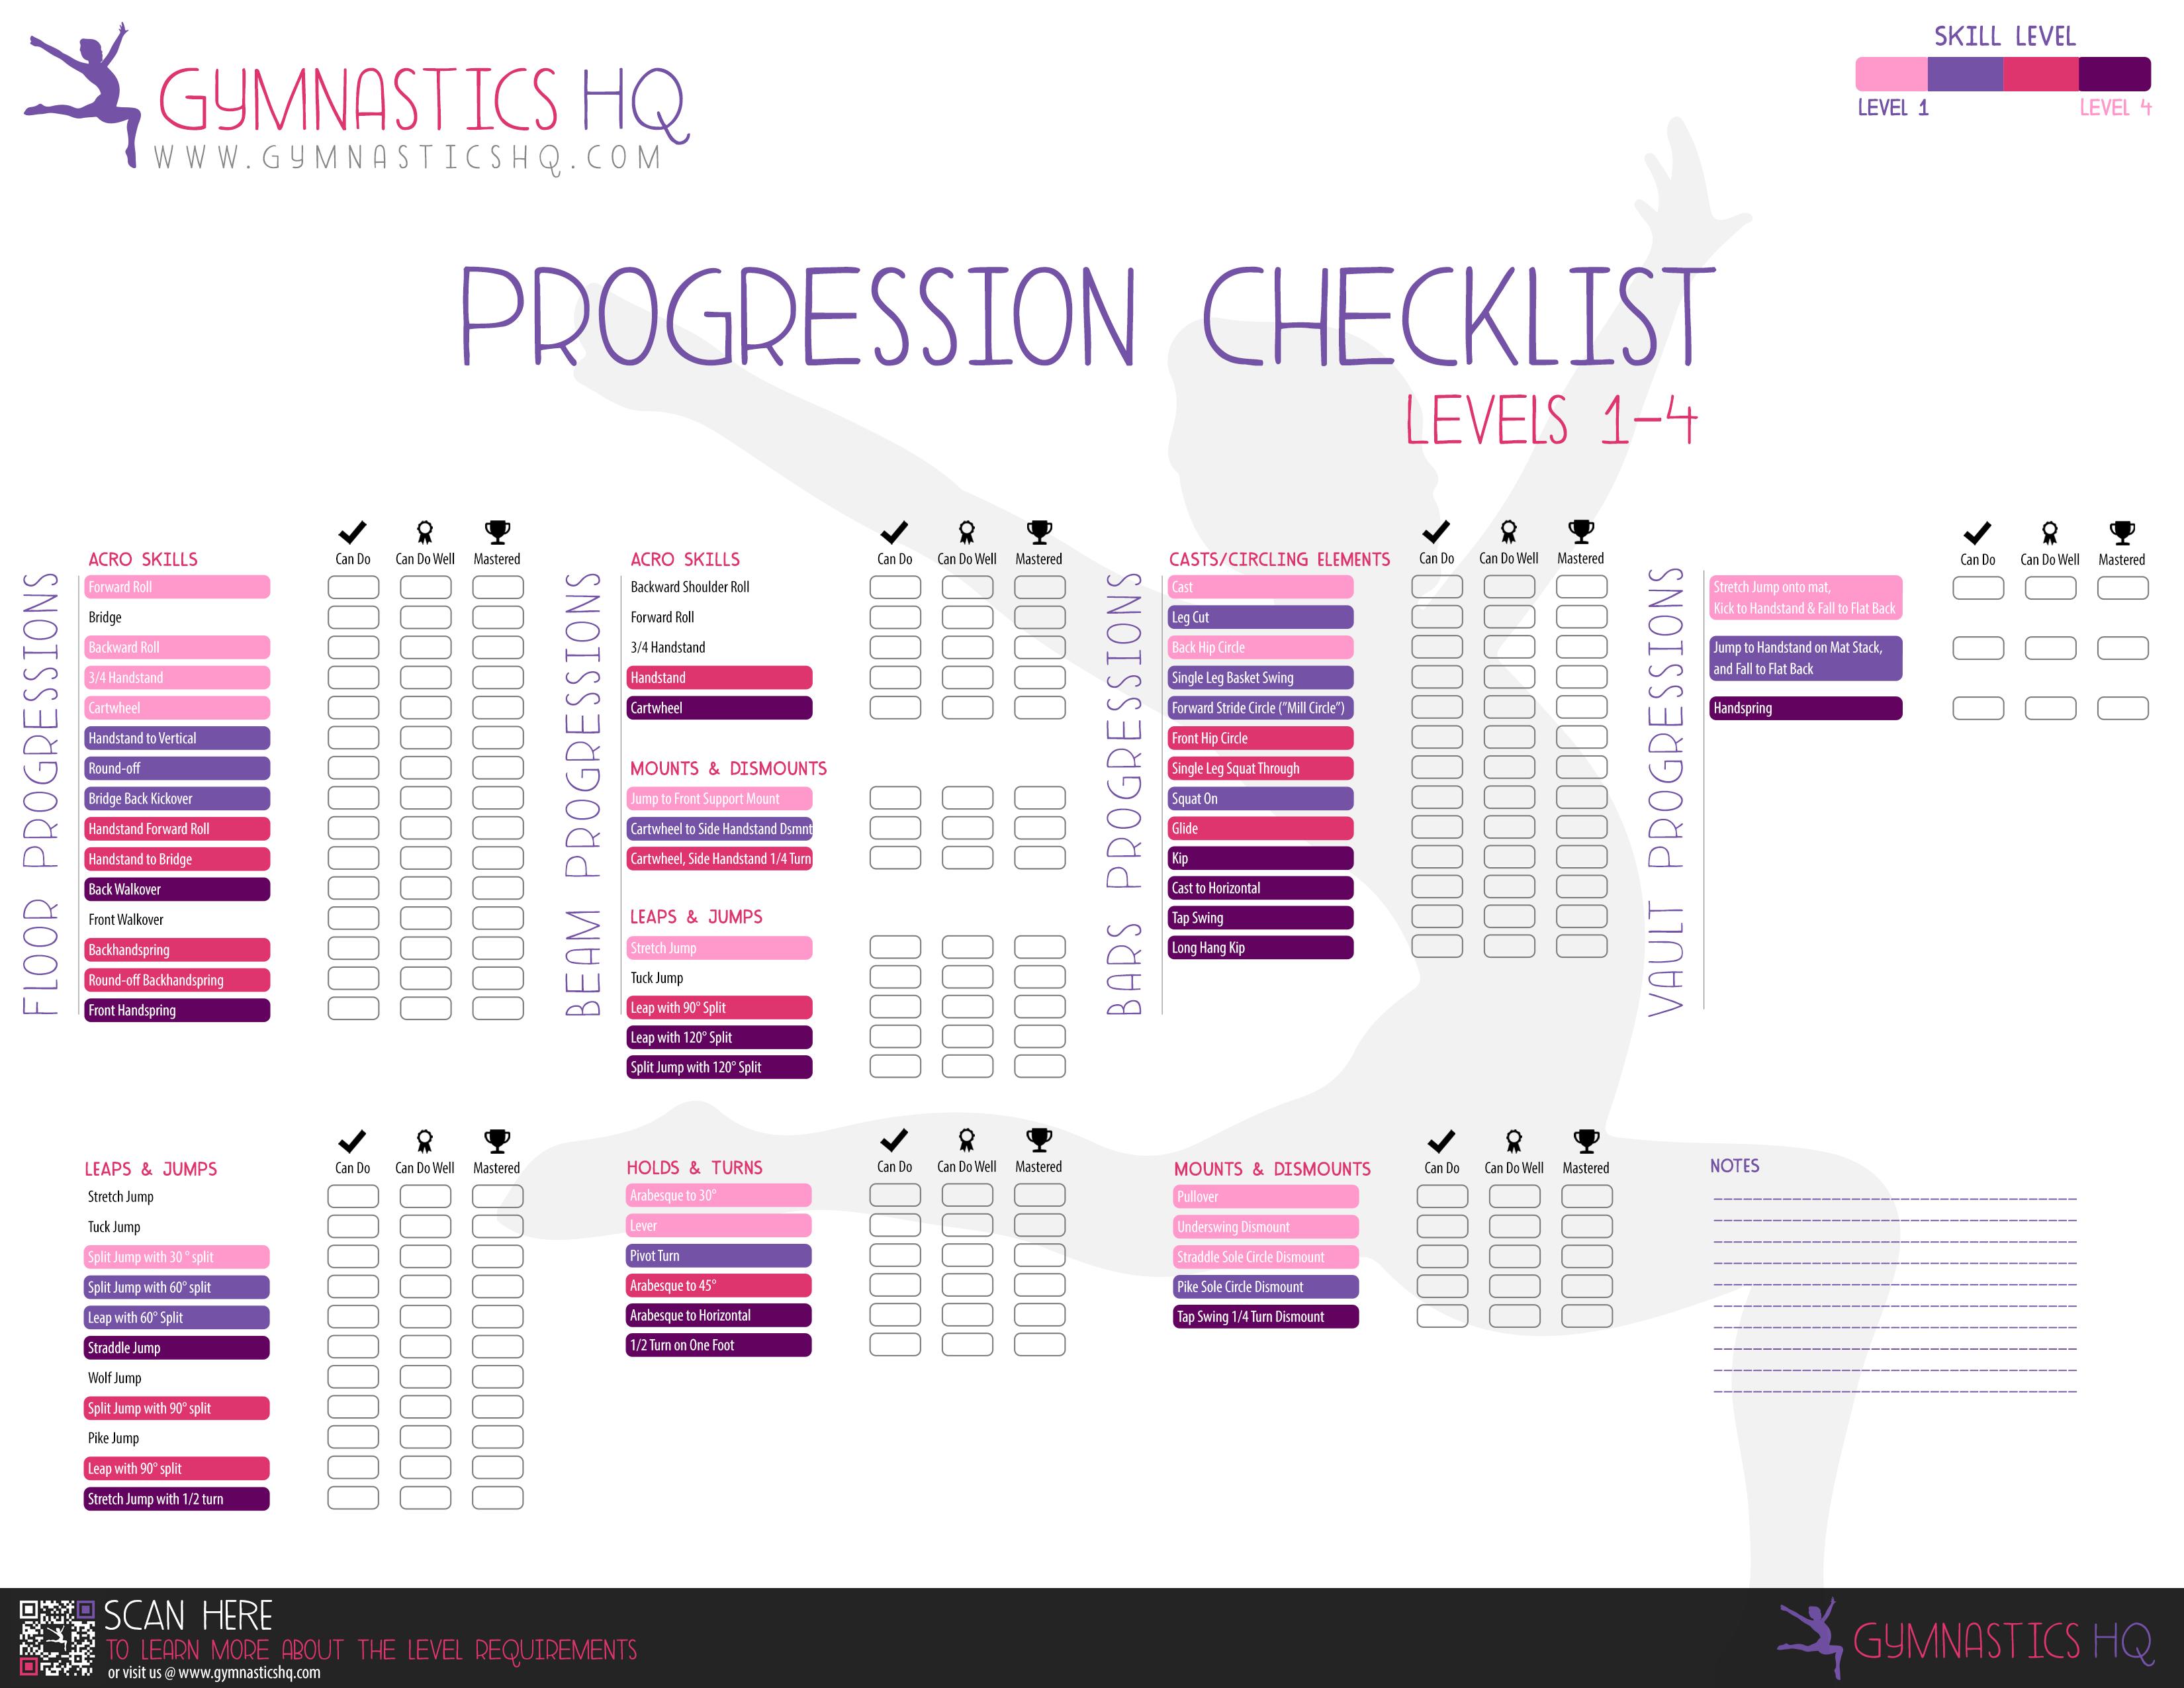 level 2 checklist confirmation